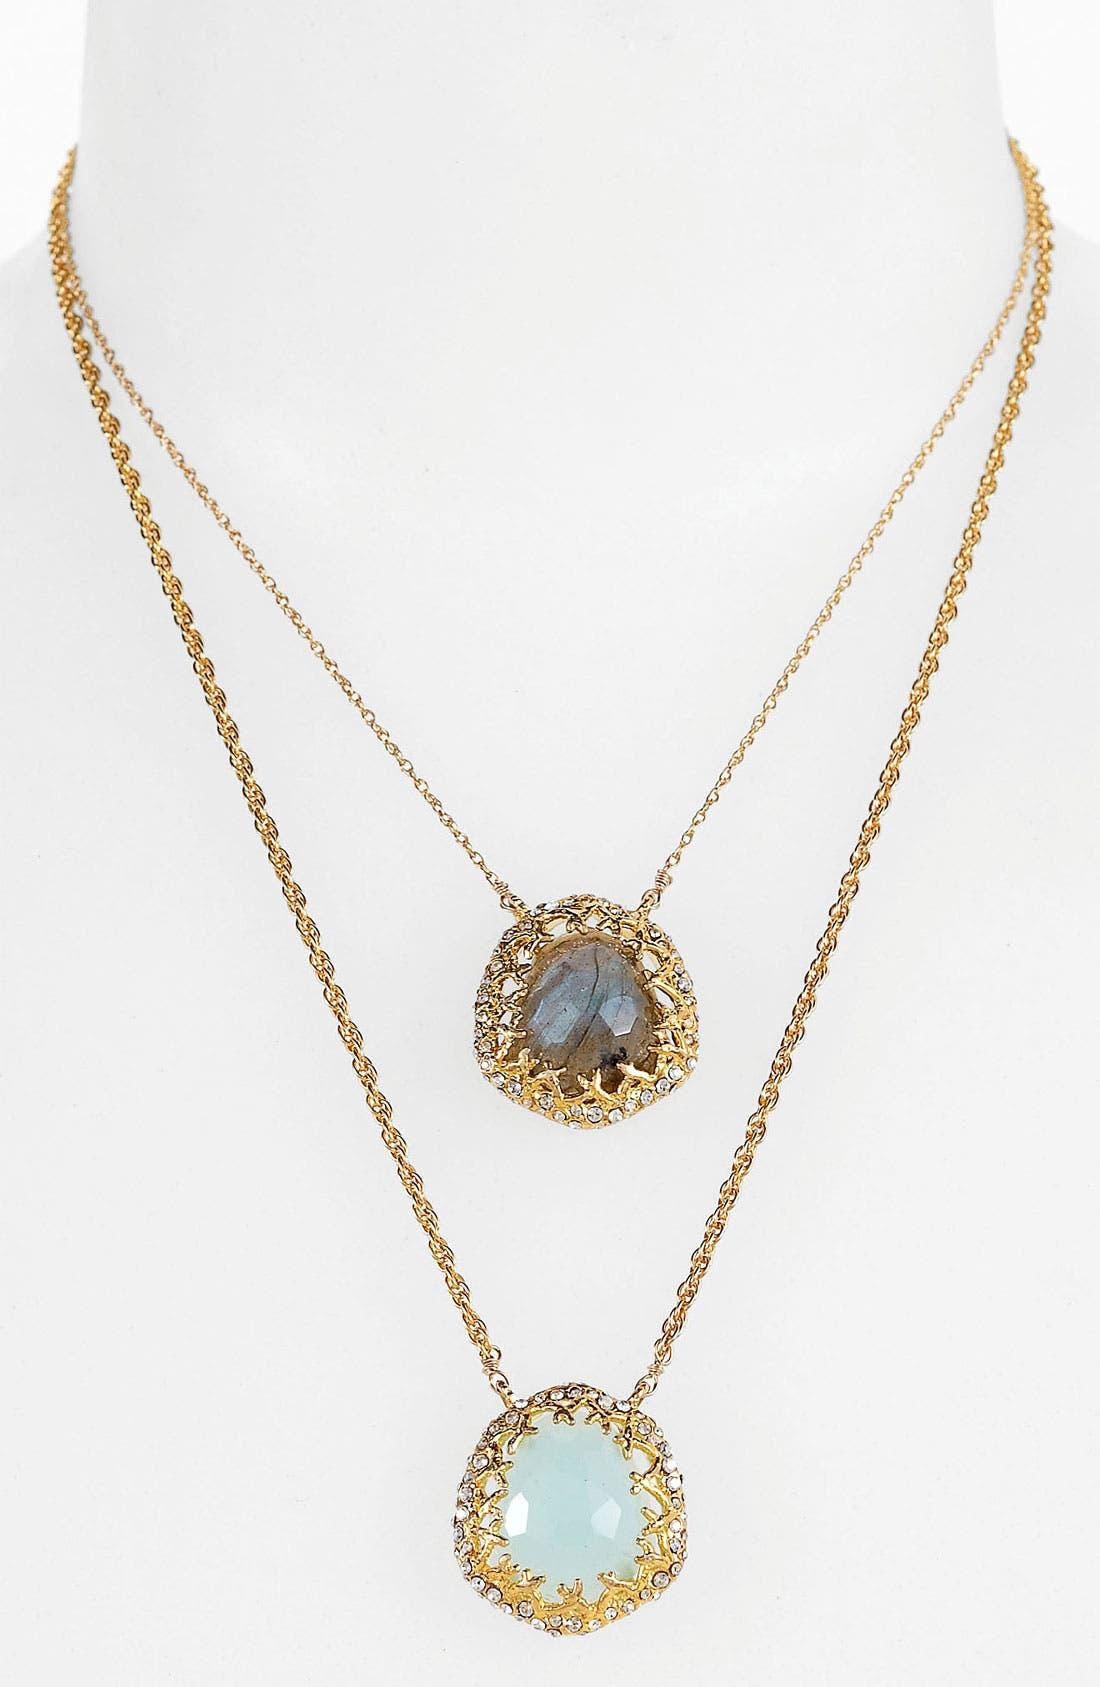 'Elements - Siyabona' Double Pendant Necklace,                             Main thumbnail 1, color,                             Gold/ Chalcedony / Labradorite